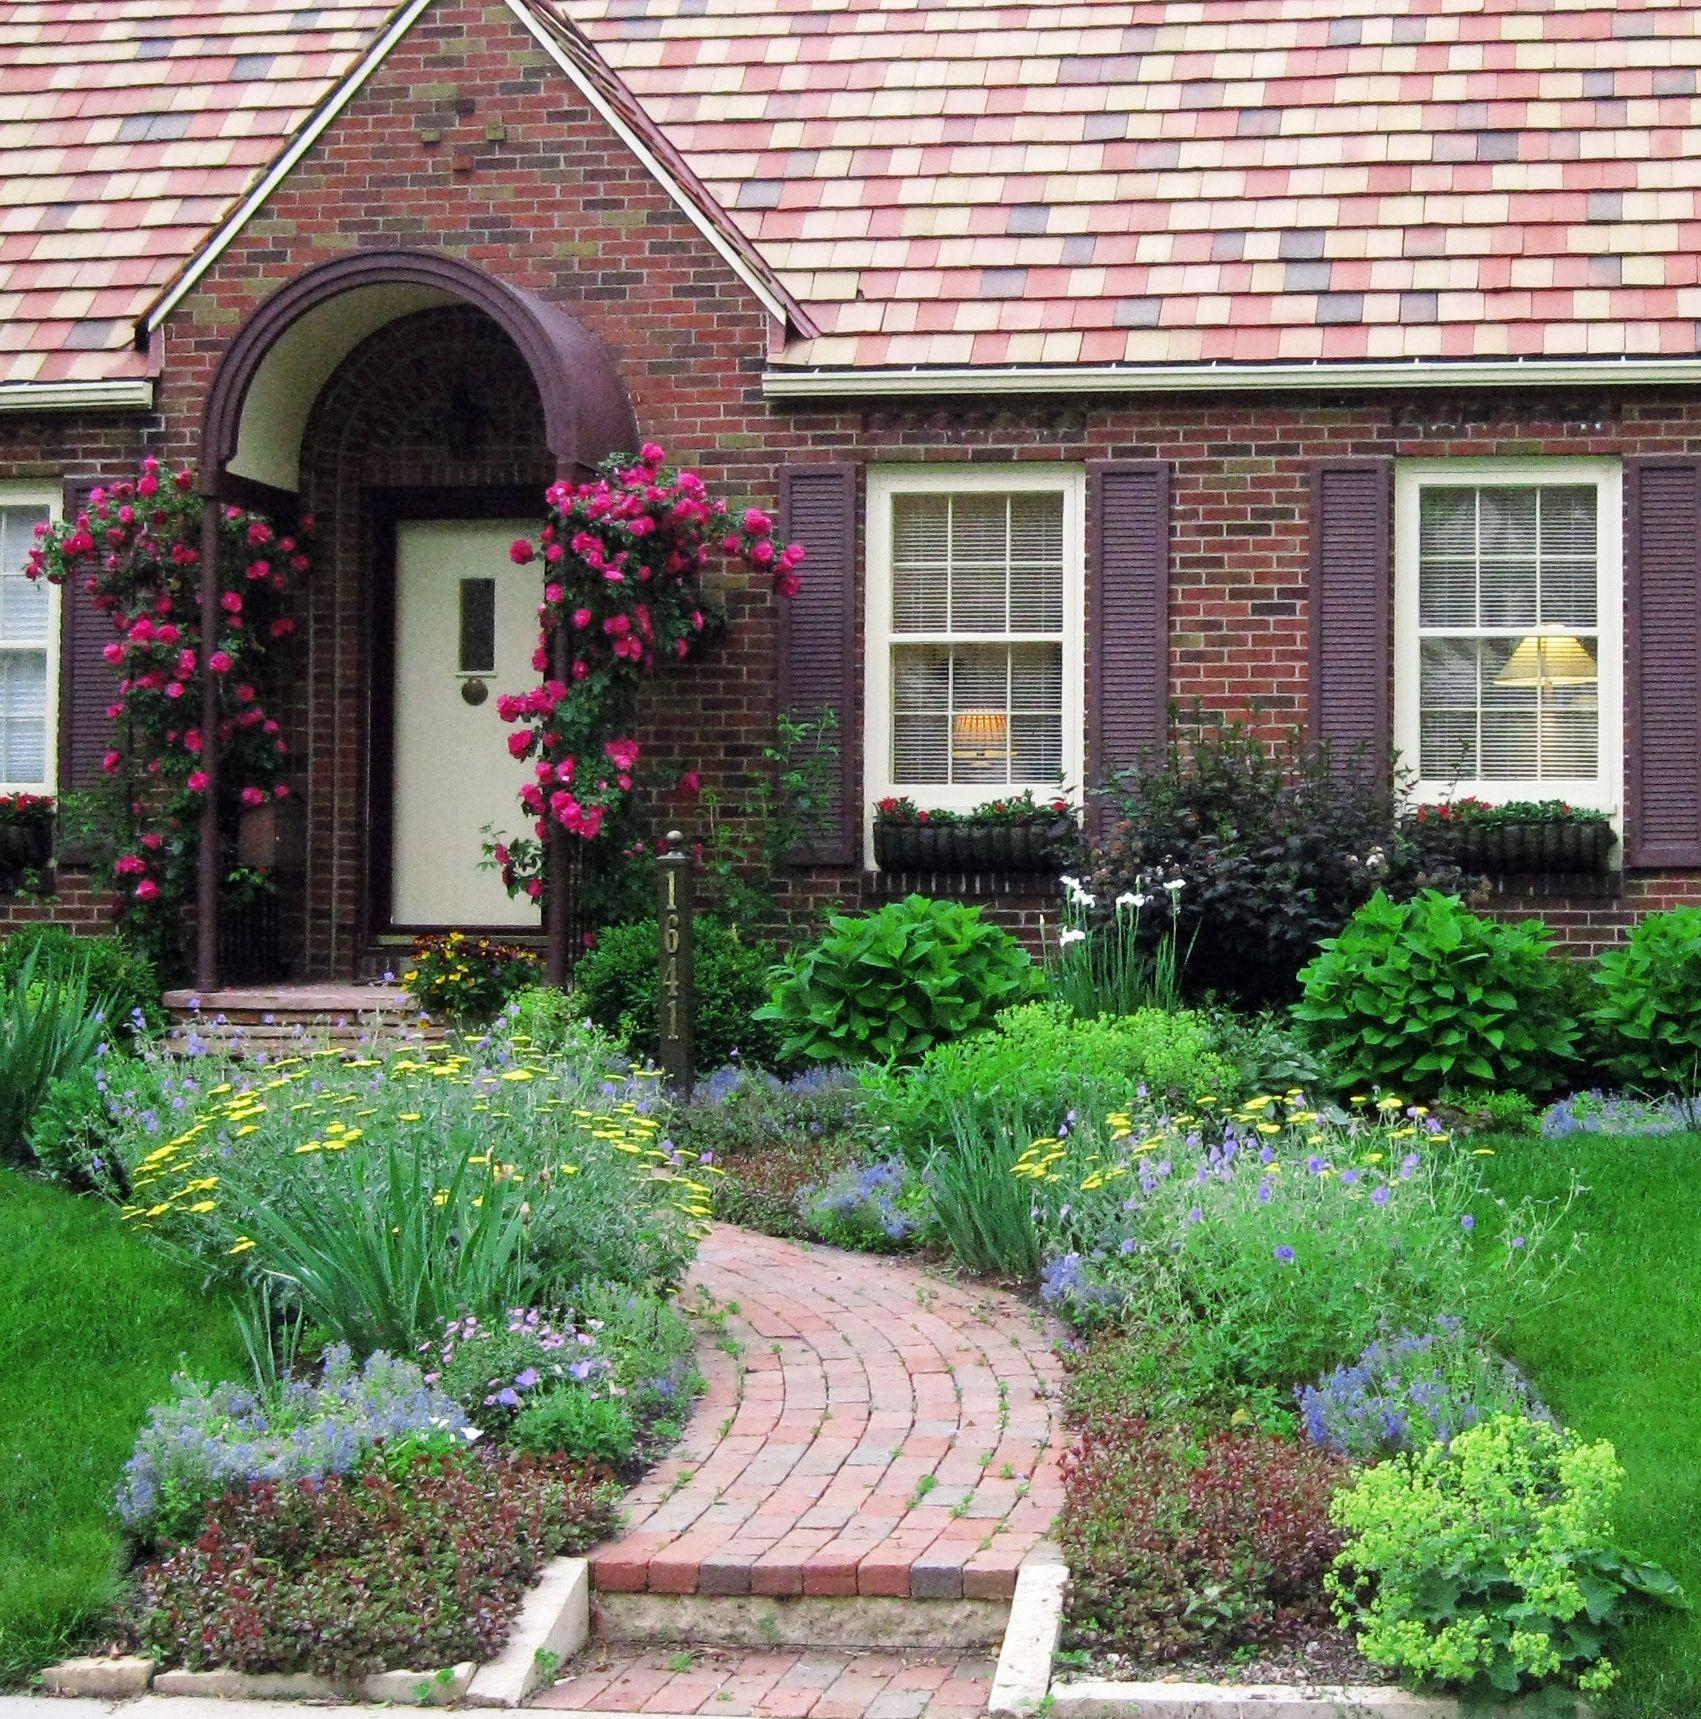 Front Yard Cottage Garden Ideas front yard cottage garden john cabot climbing roses | lori mccabe